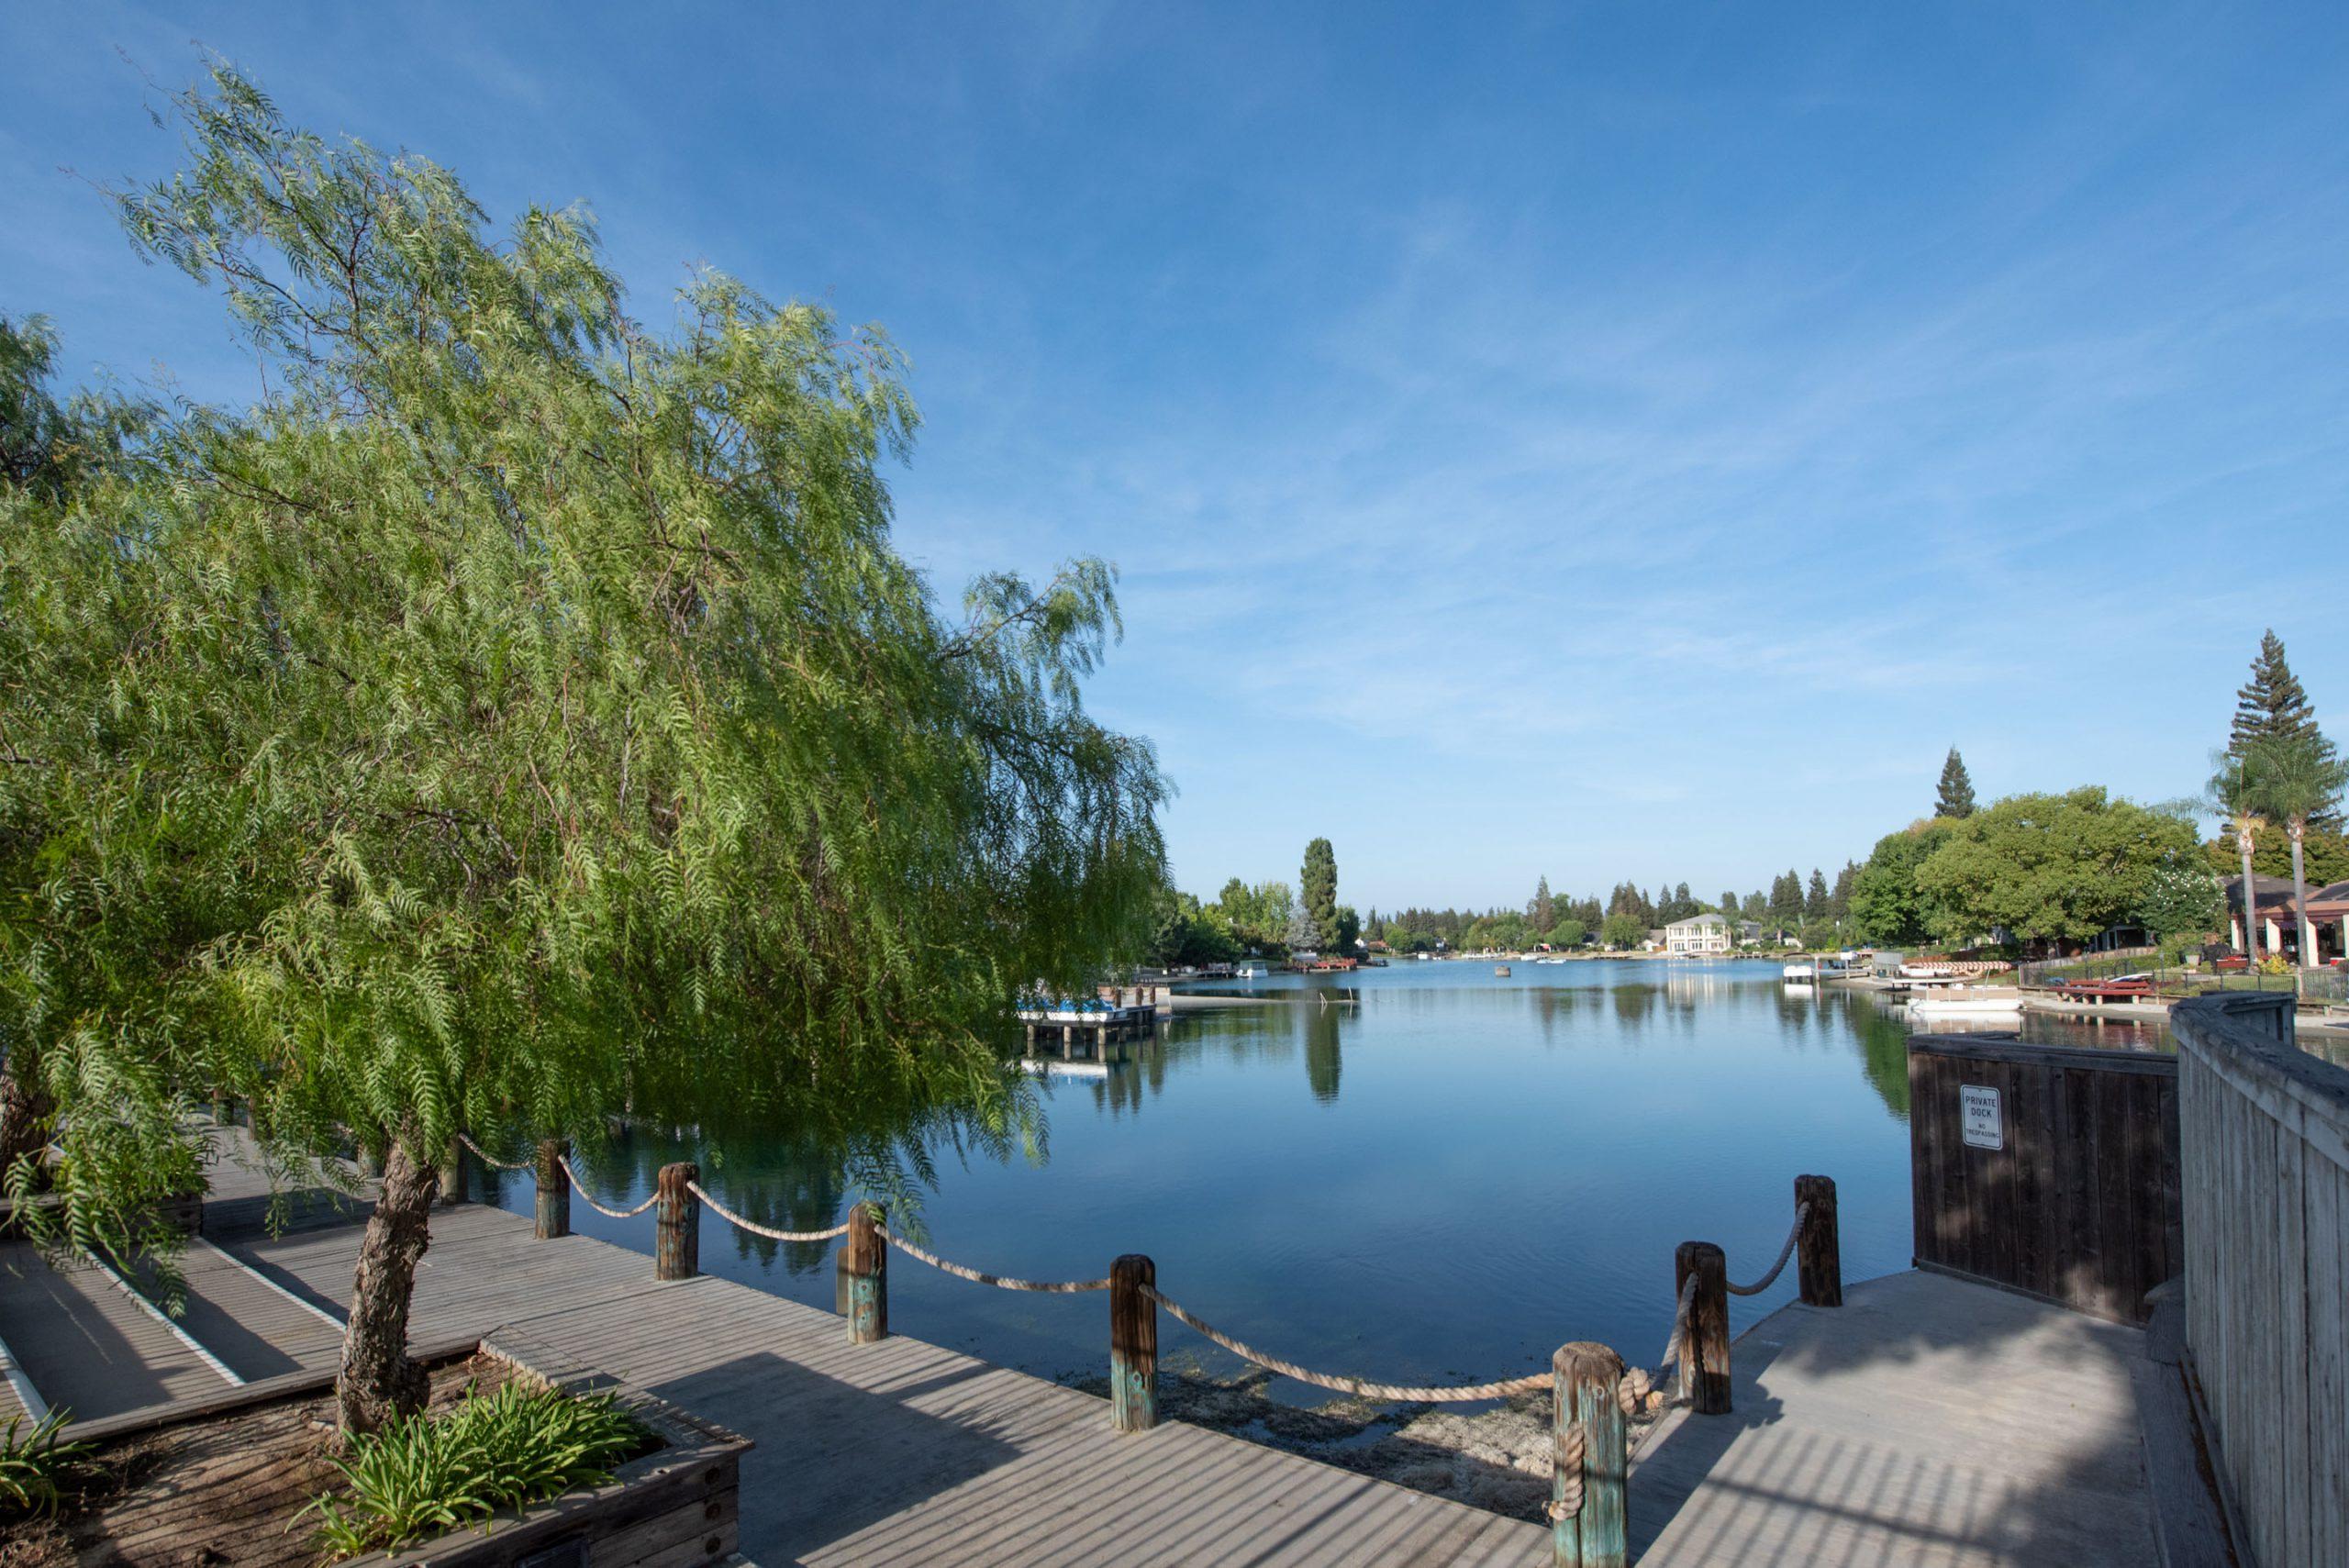 Moss Creek - Dock